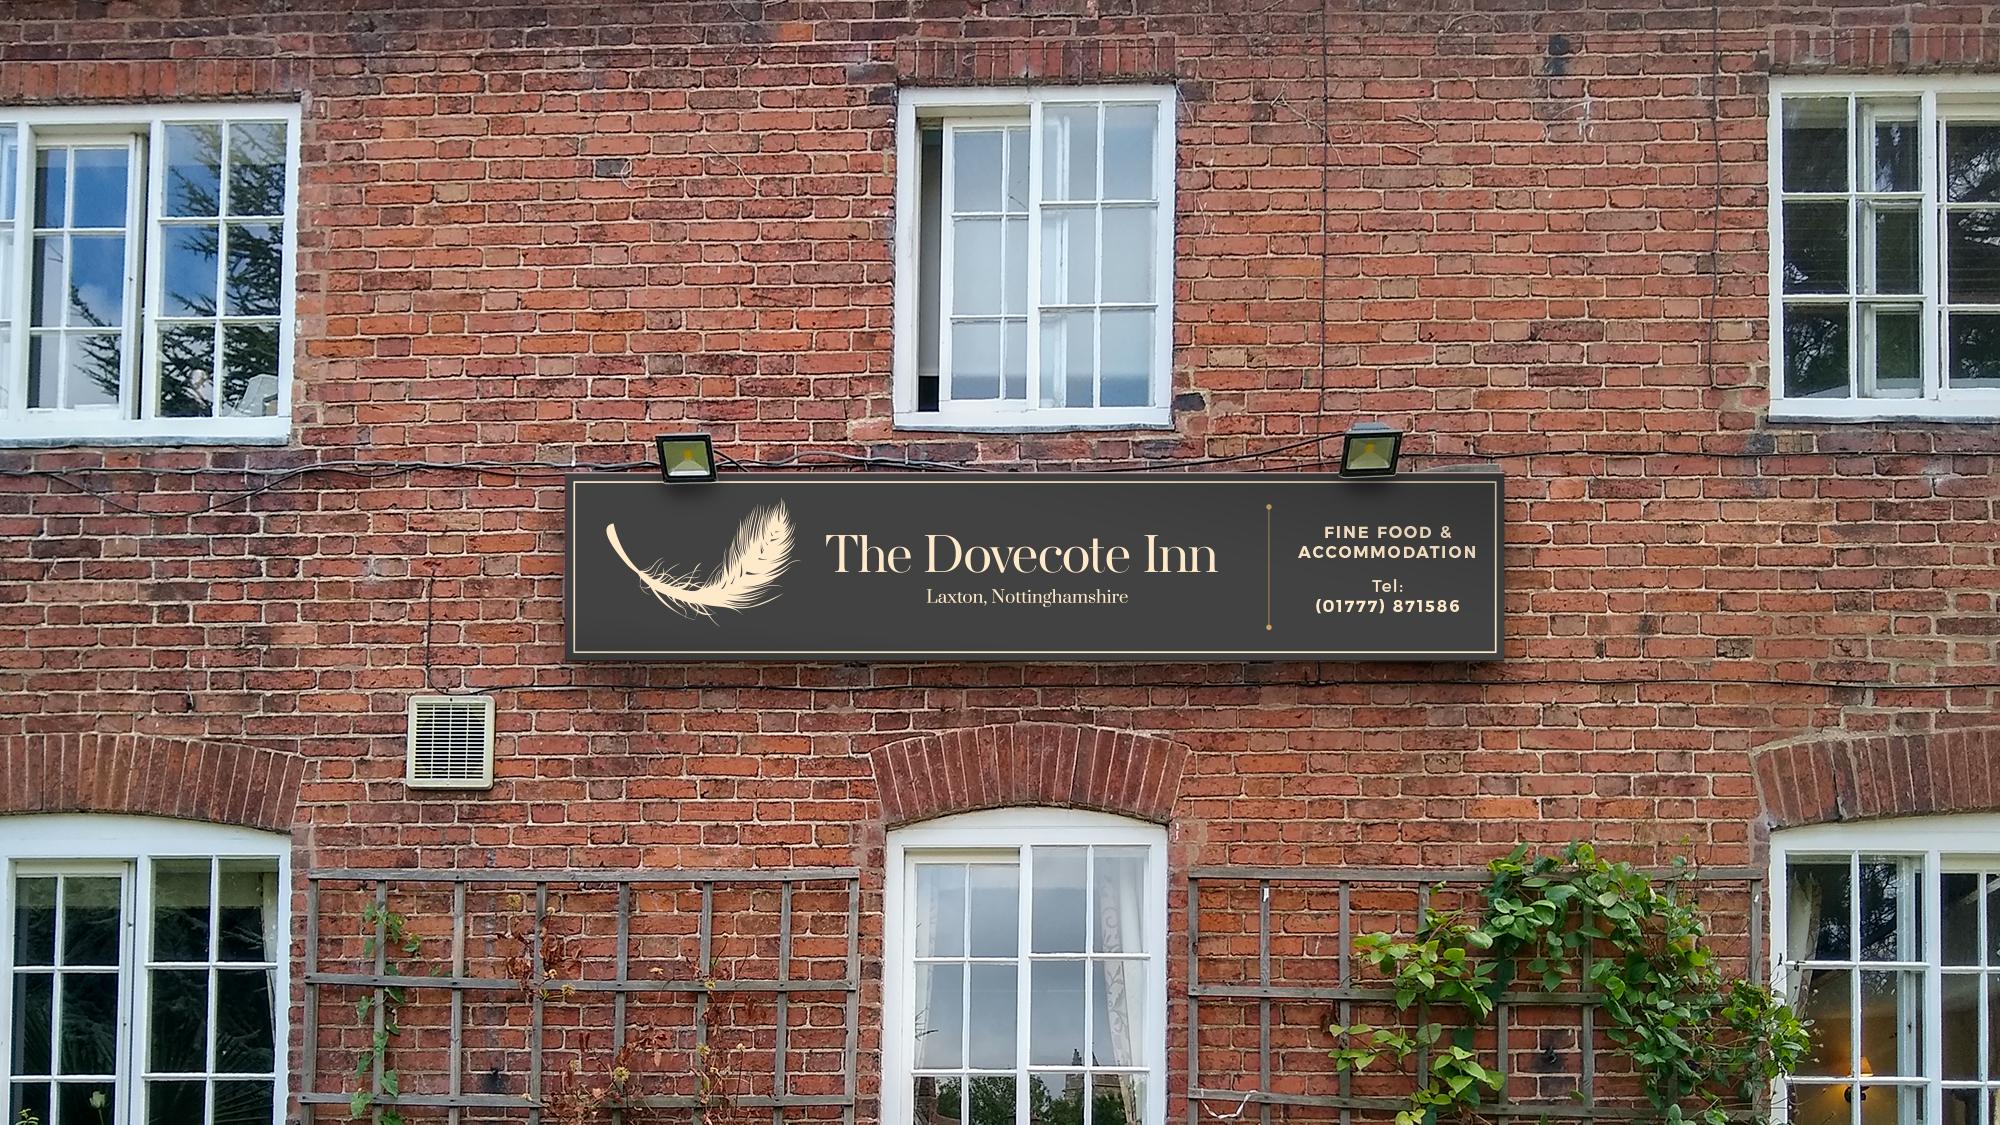 The Dovecote Inn Sign Design